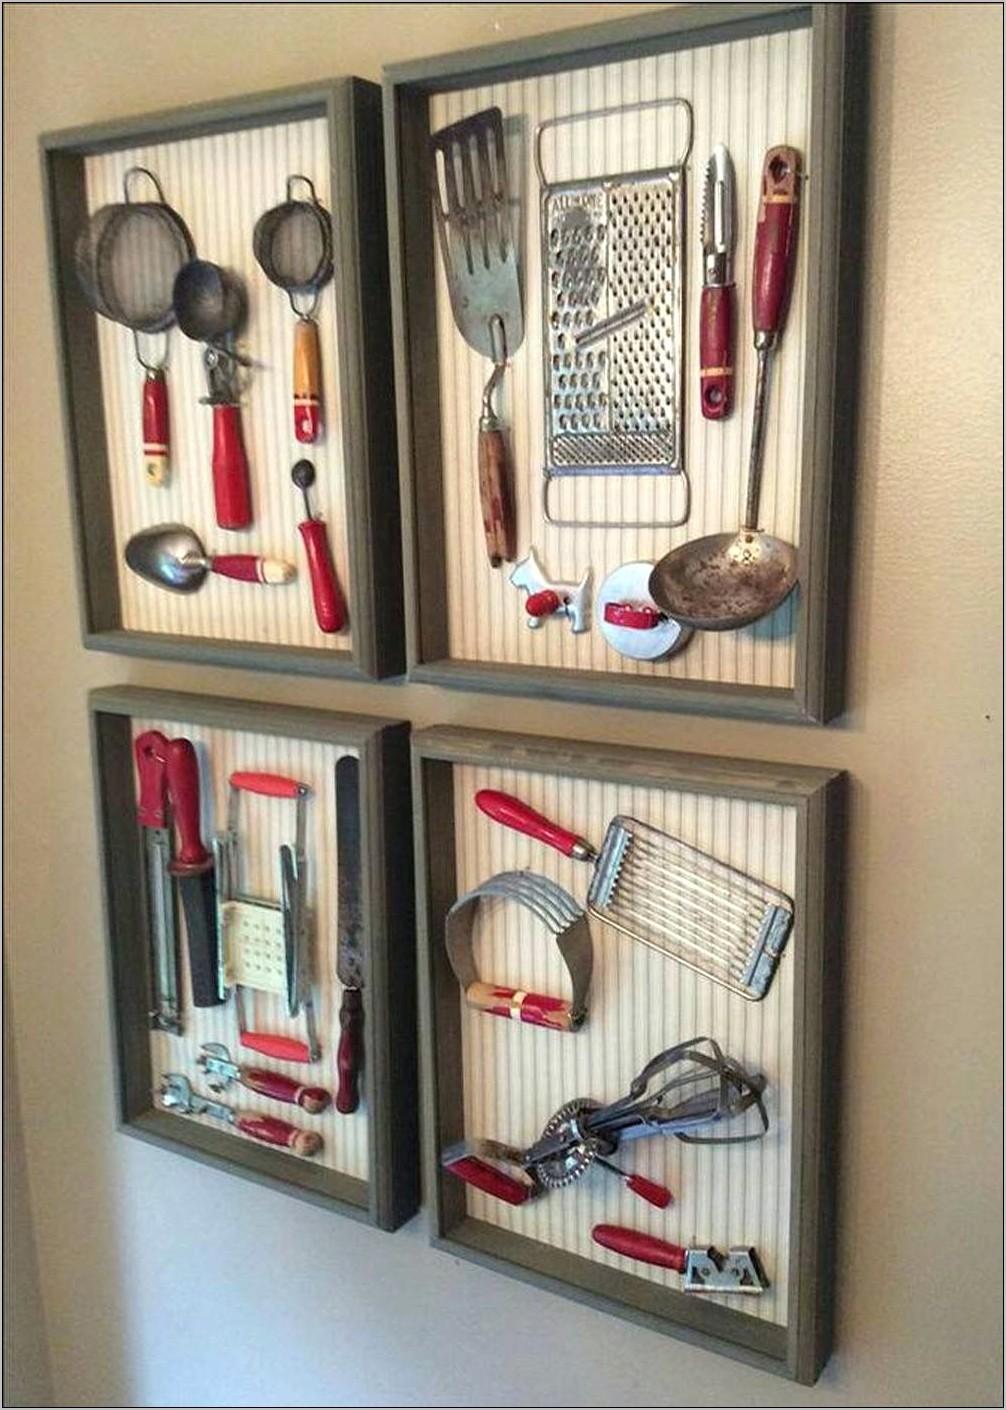 Dining Room Decor Vintage Kitchen Utensils